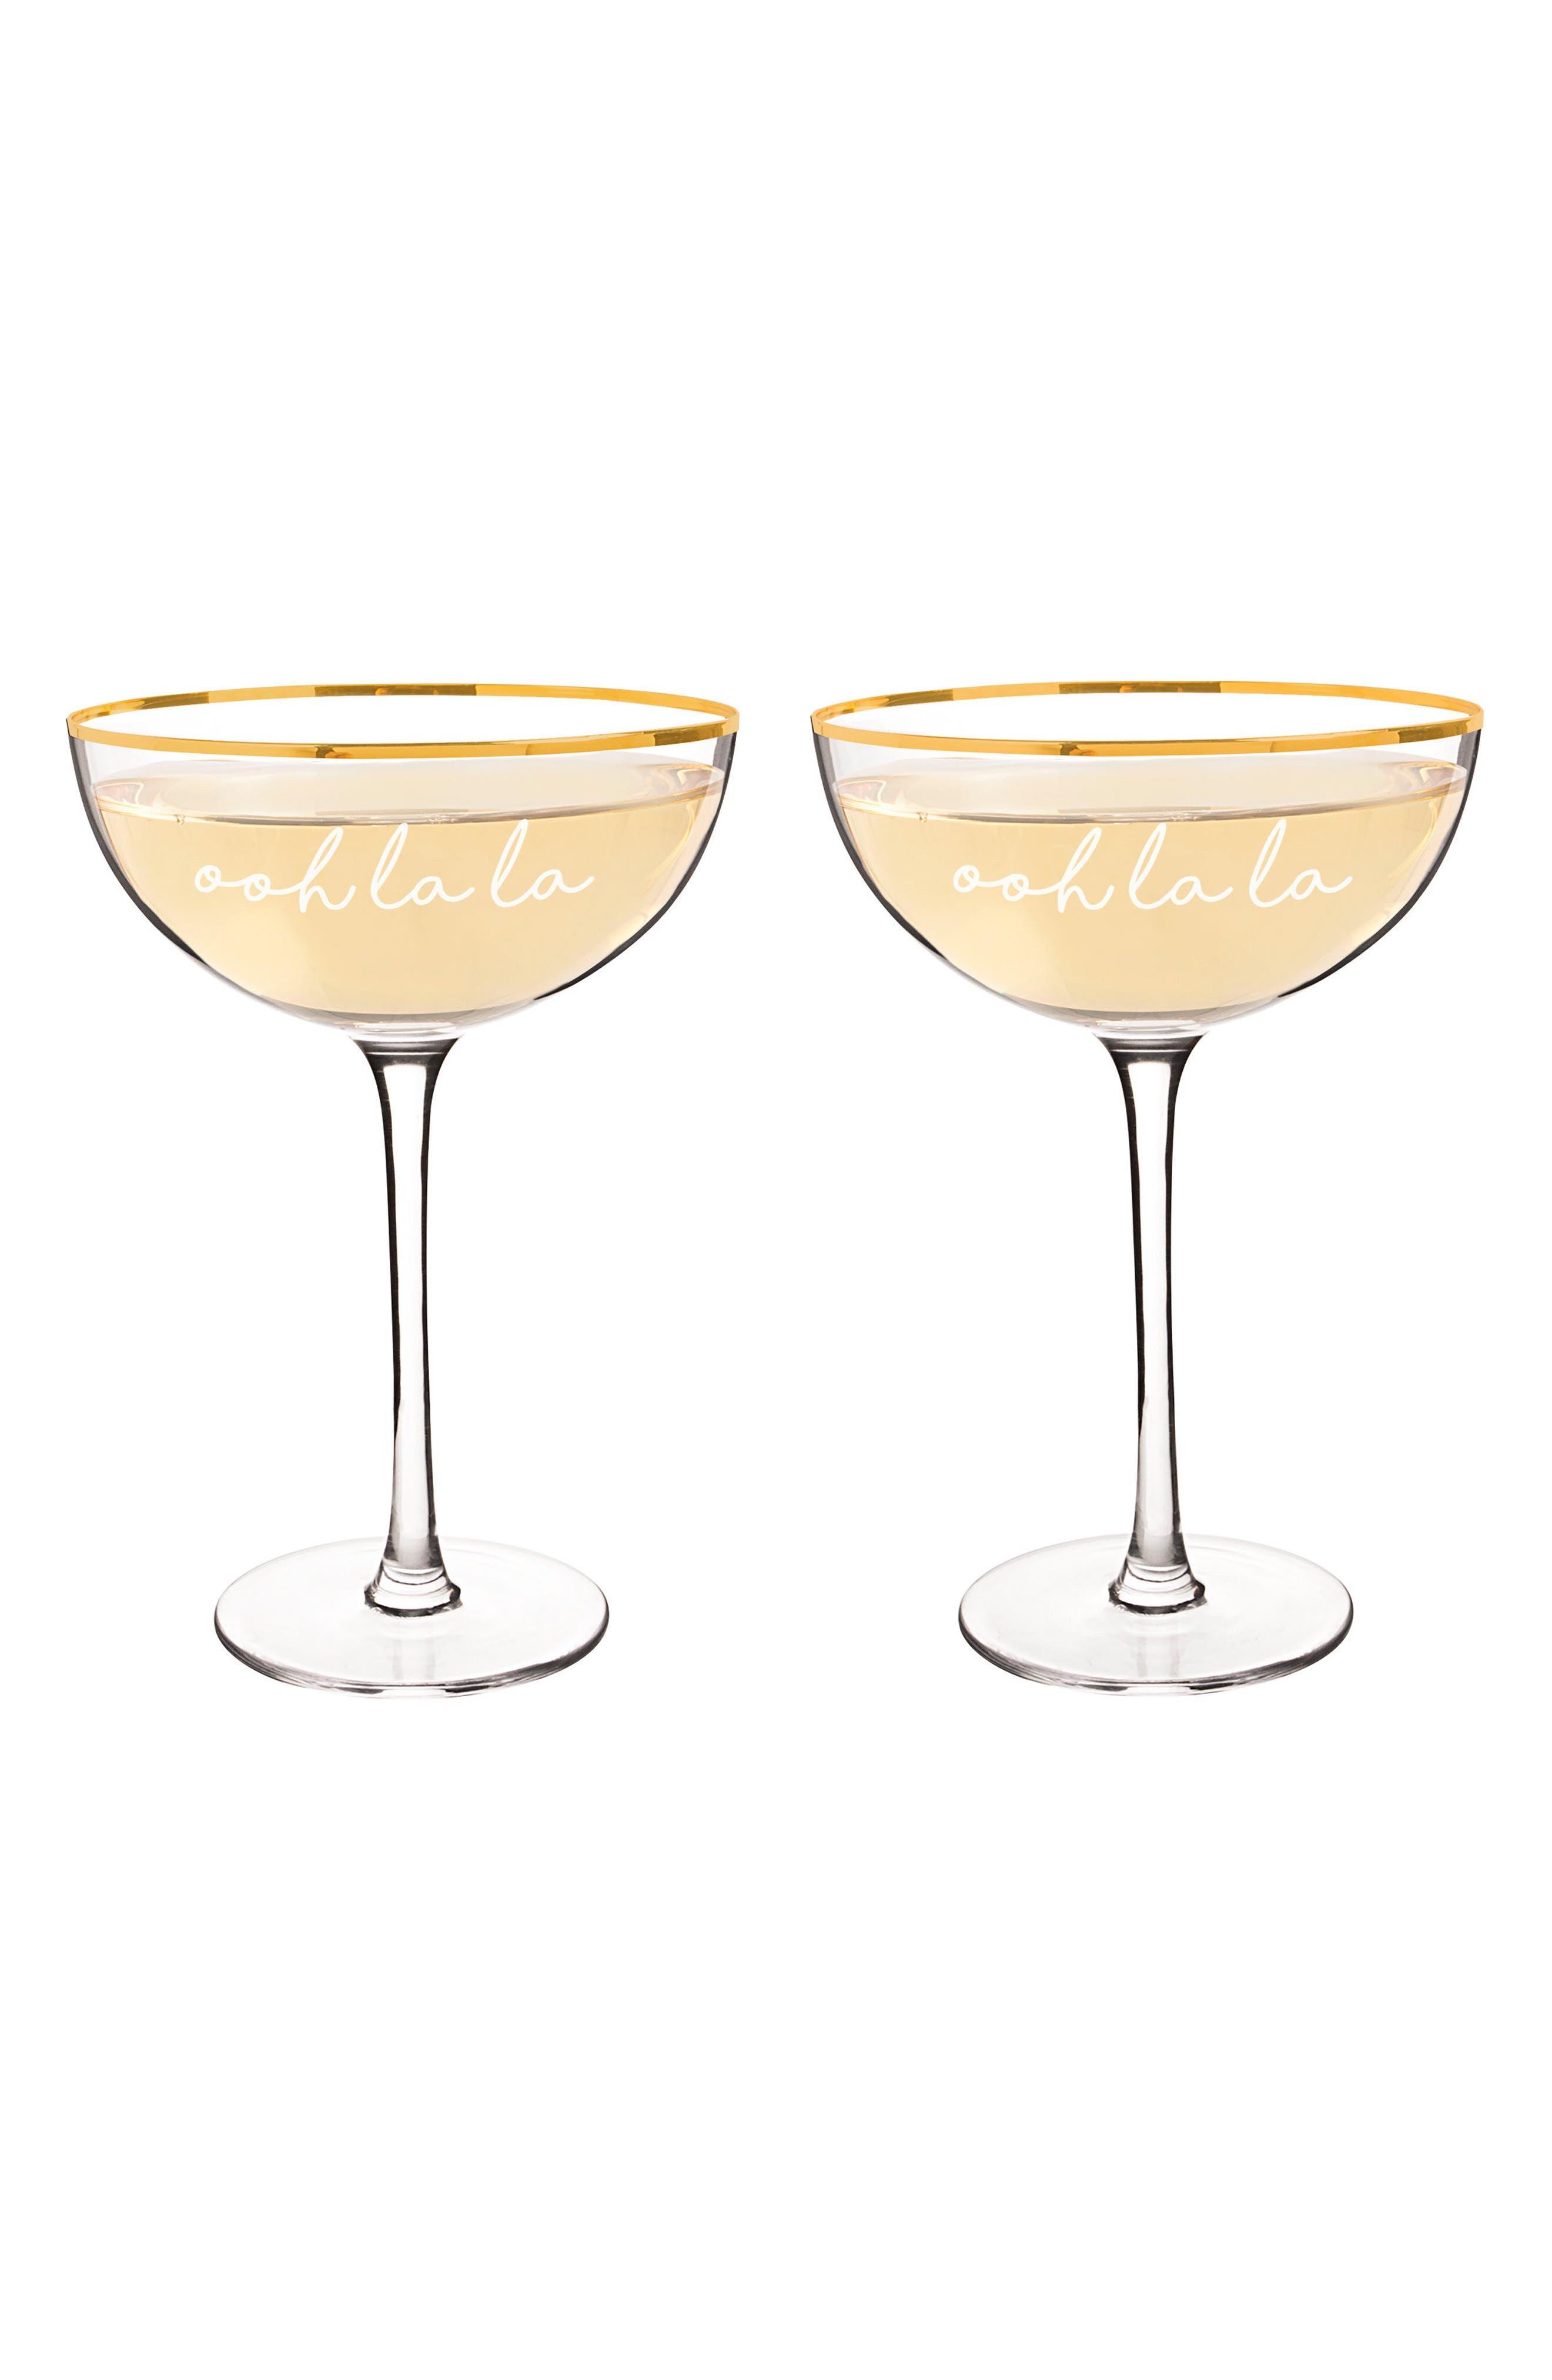 Ooh La La Set of 2 Champagne Coupes,                         Main,                         color,